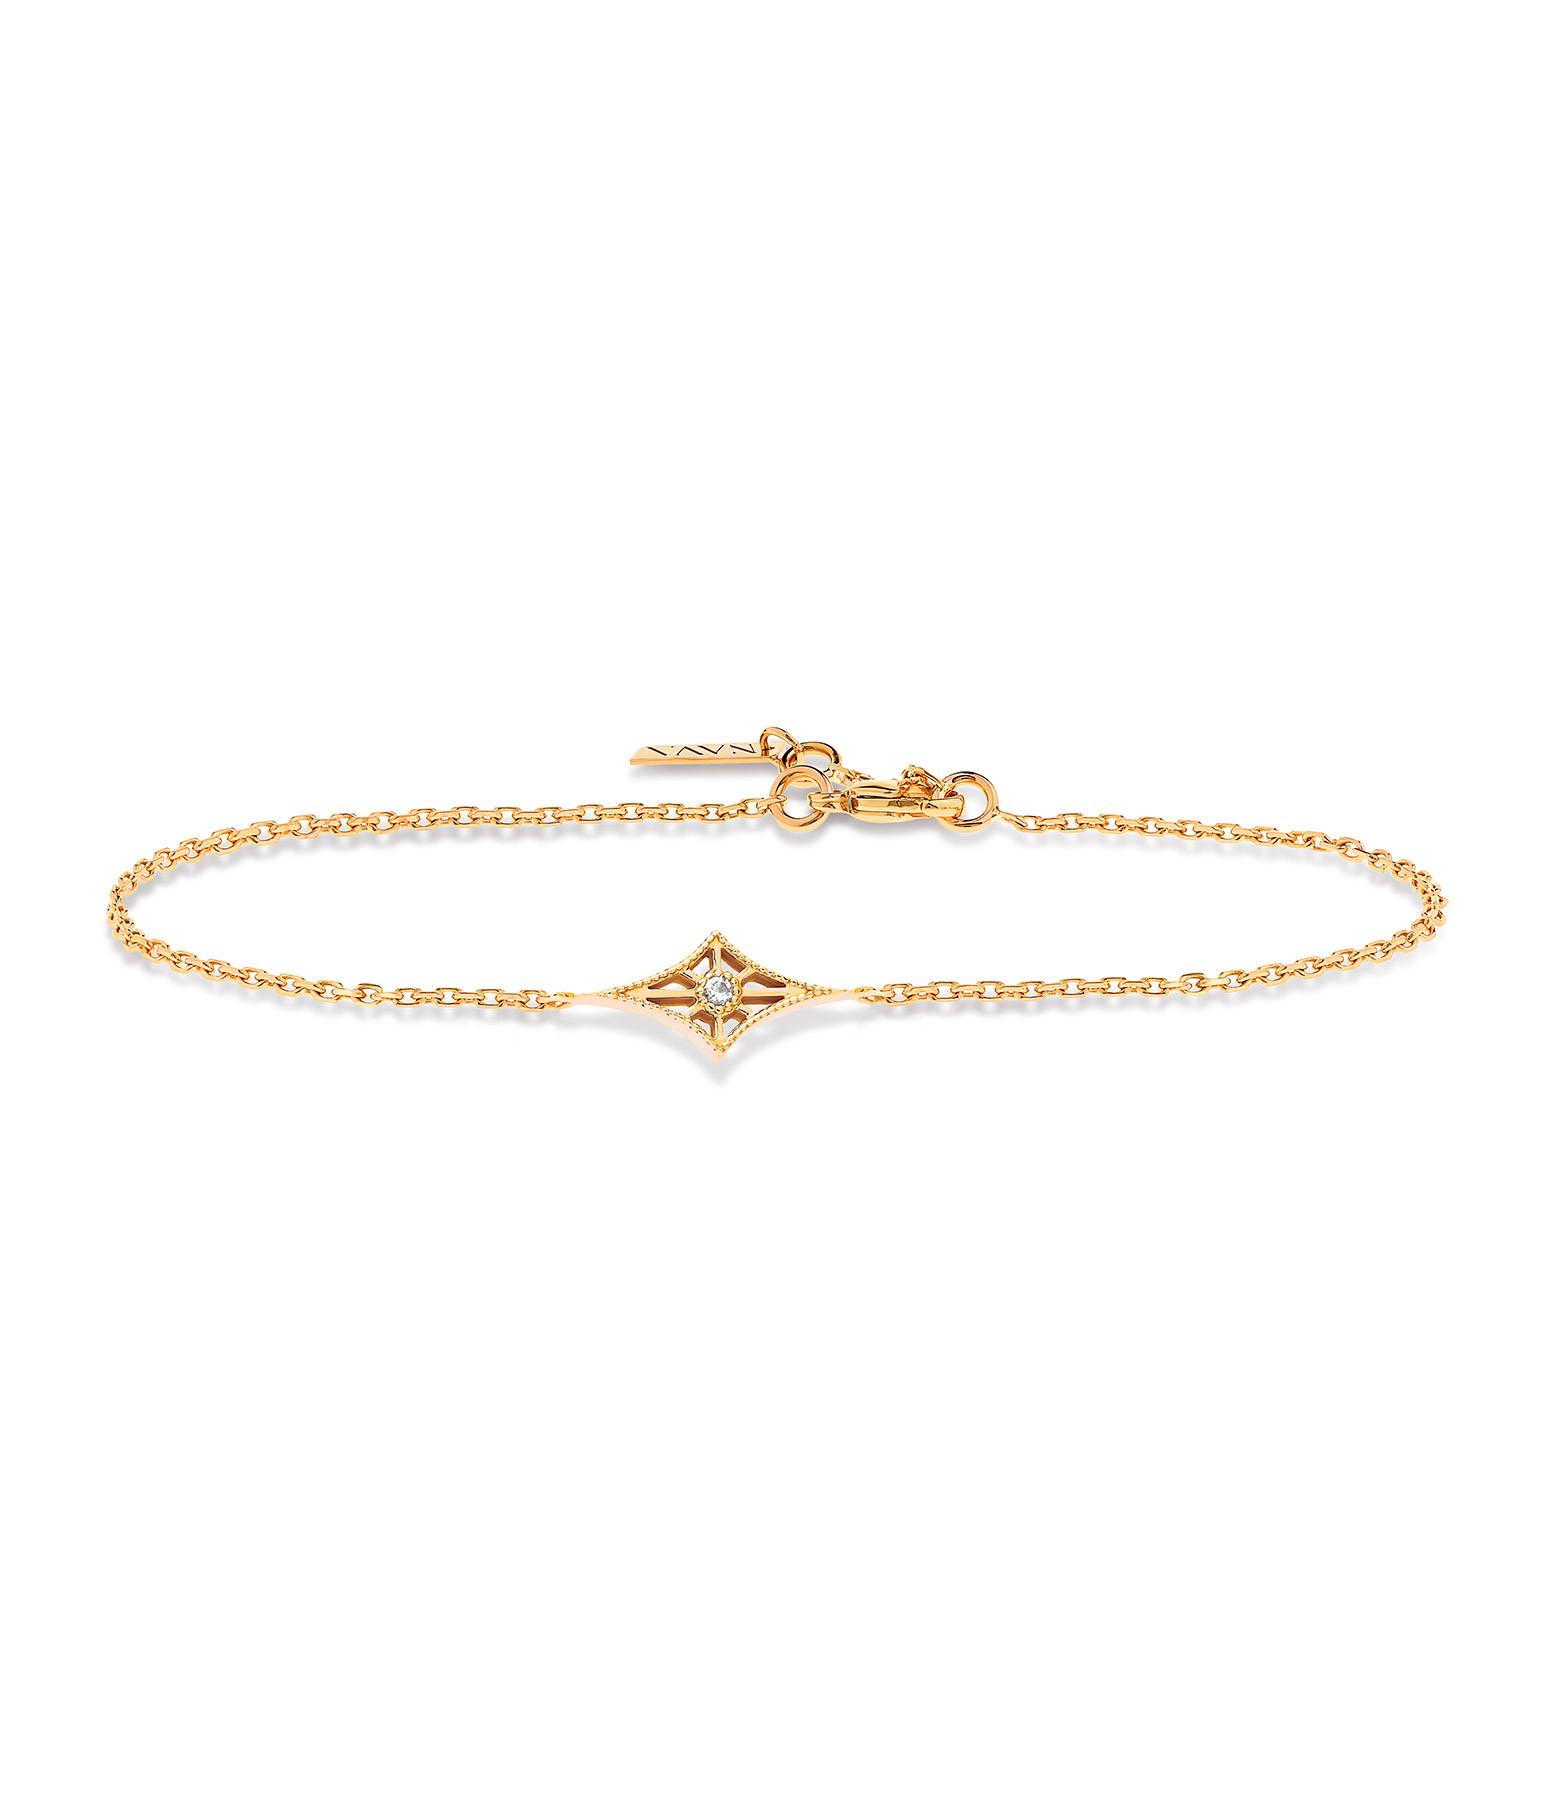 NAVA JOAILLERIE - Bracelet Cheyenne Losange Or Jaune